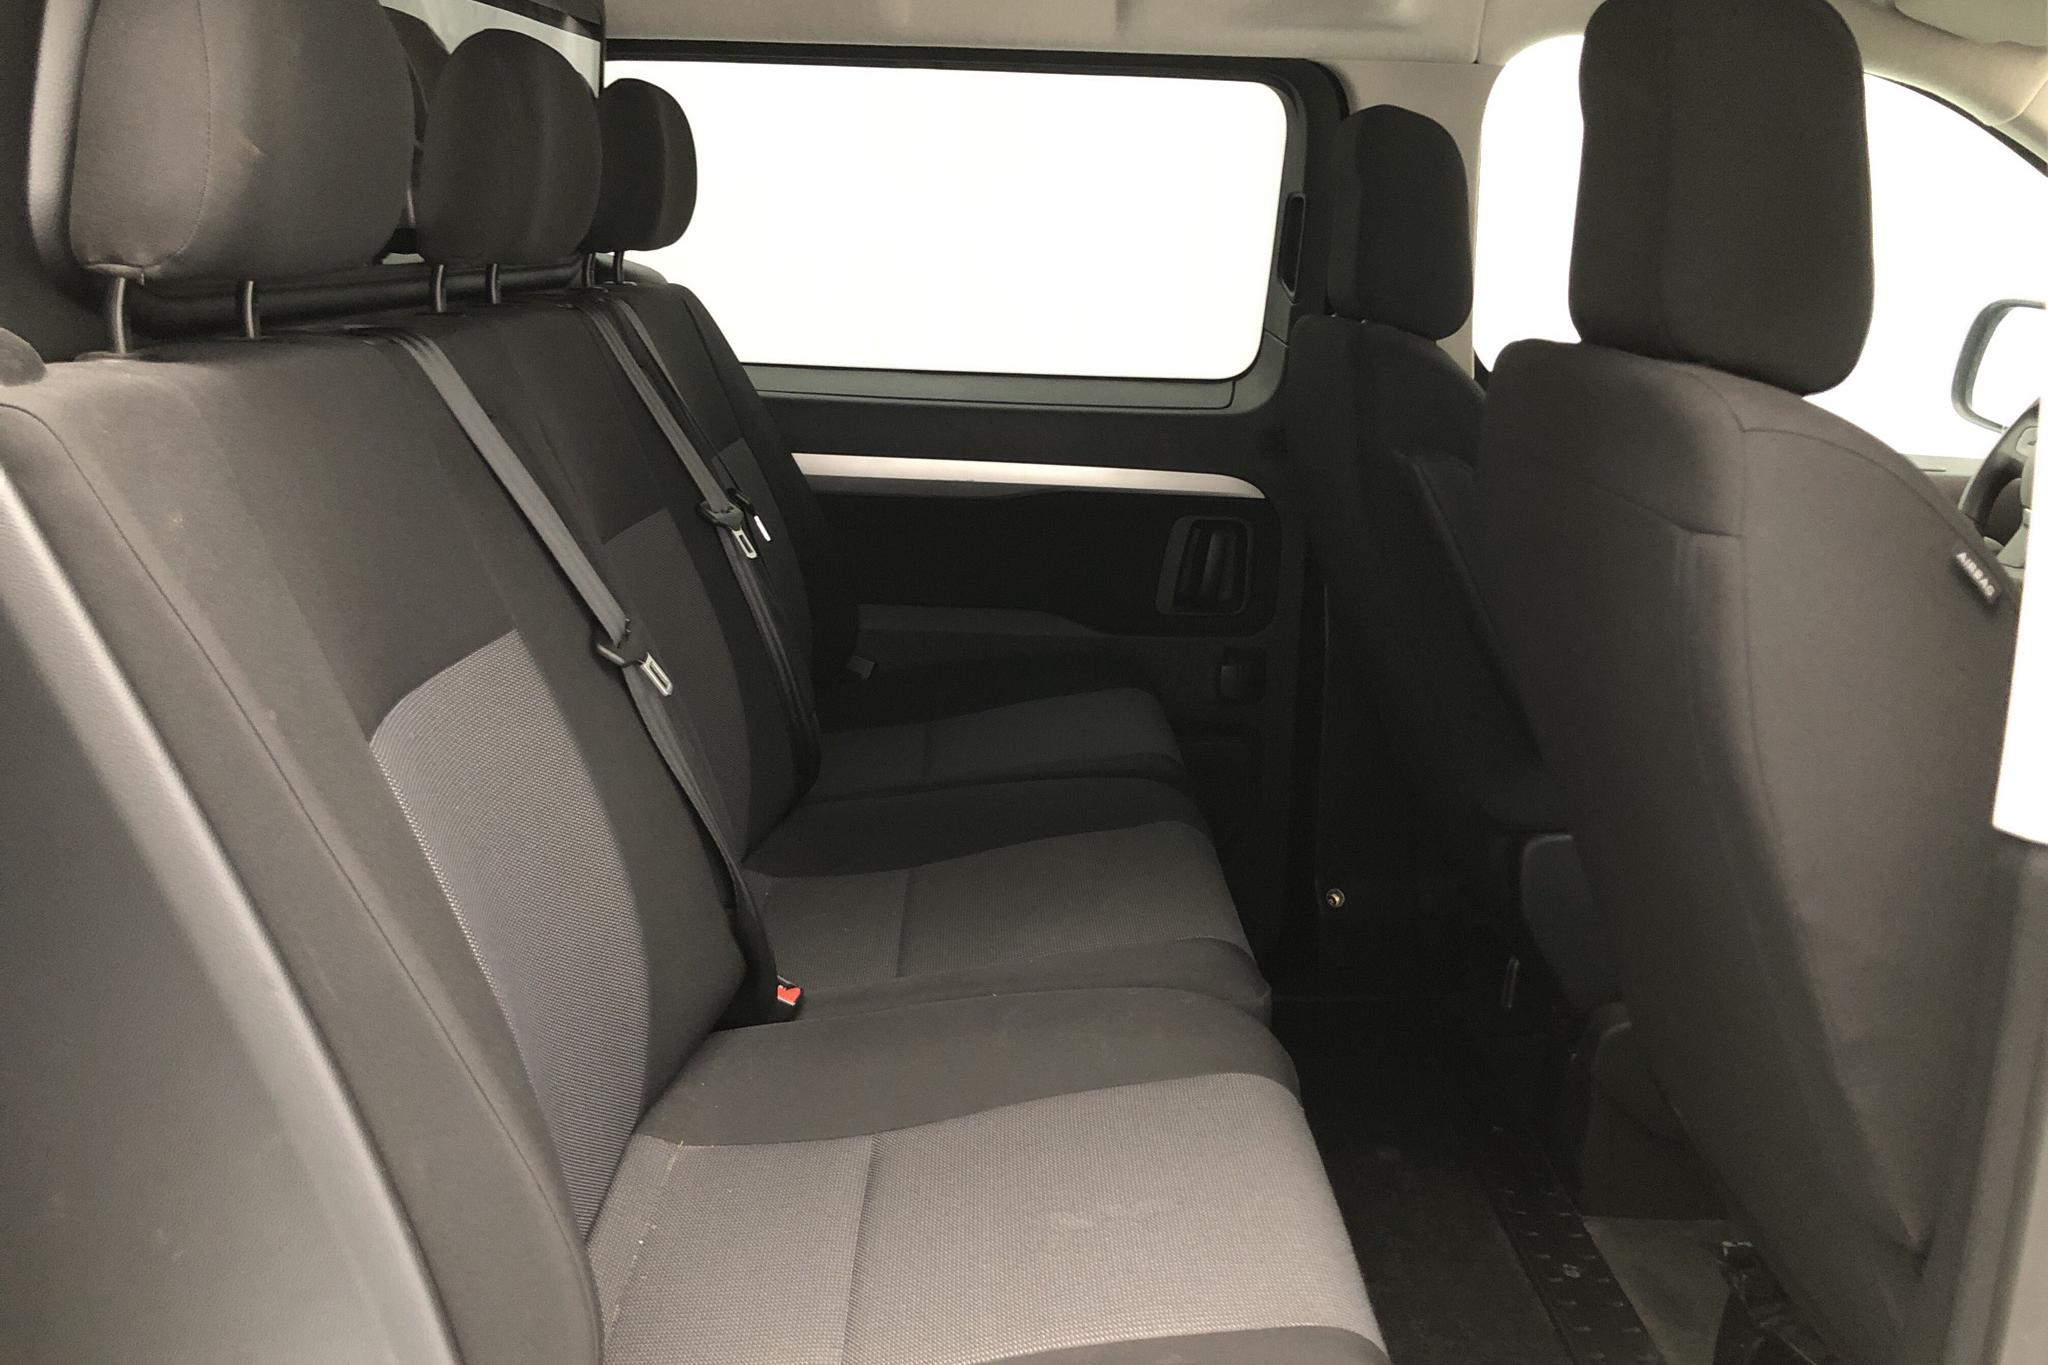 Toyota PROACE 2.0 (150hk) - 6 661 mil - Manuell - svart - 2018